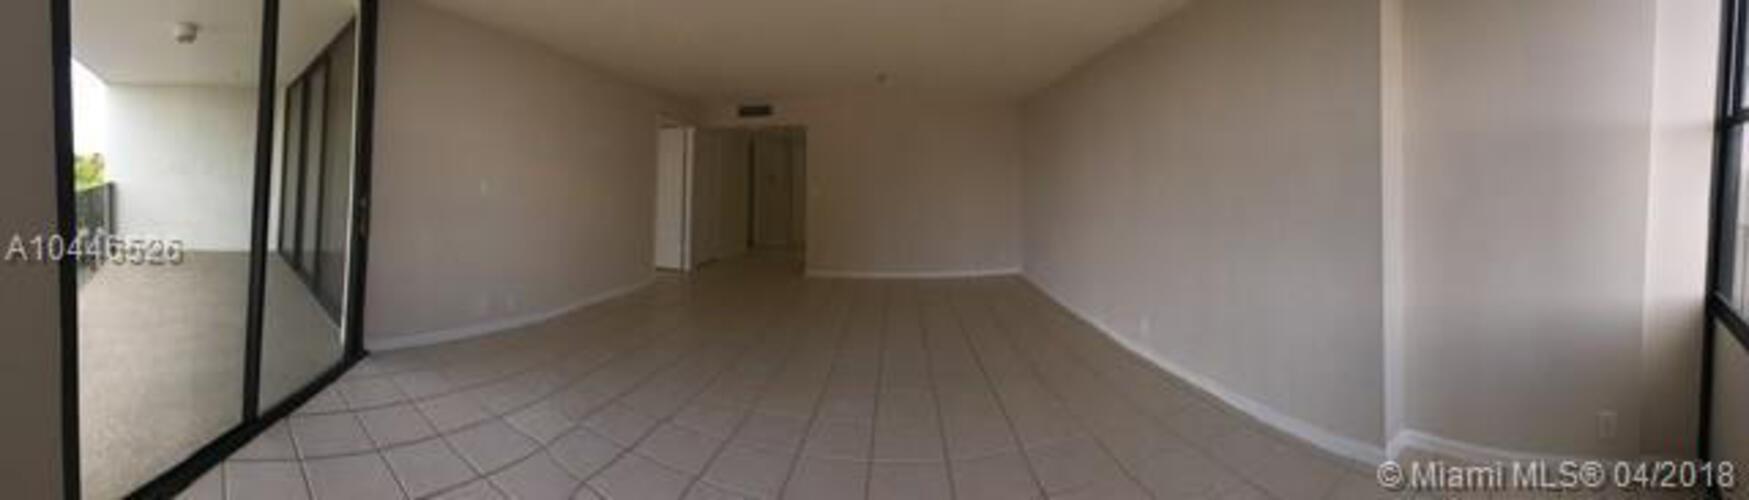 1901 Brickell Ave, Miami. FL 33129, Brickell Place I #B606, Brickell, Miami A10446526 image #6